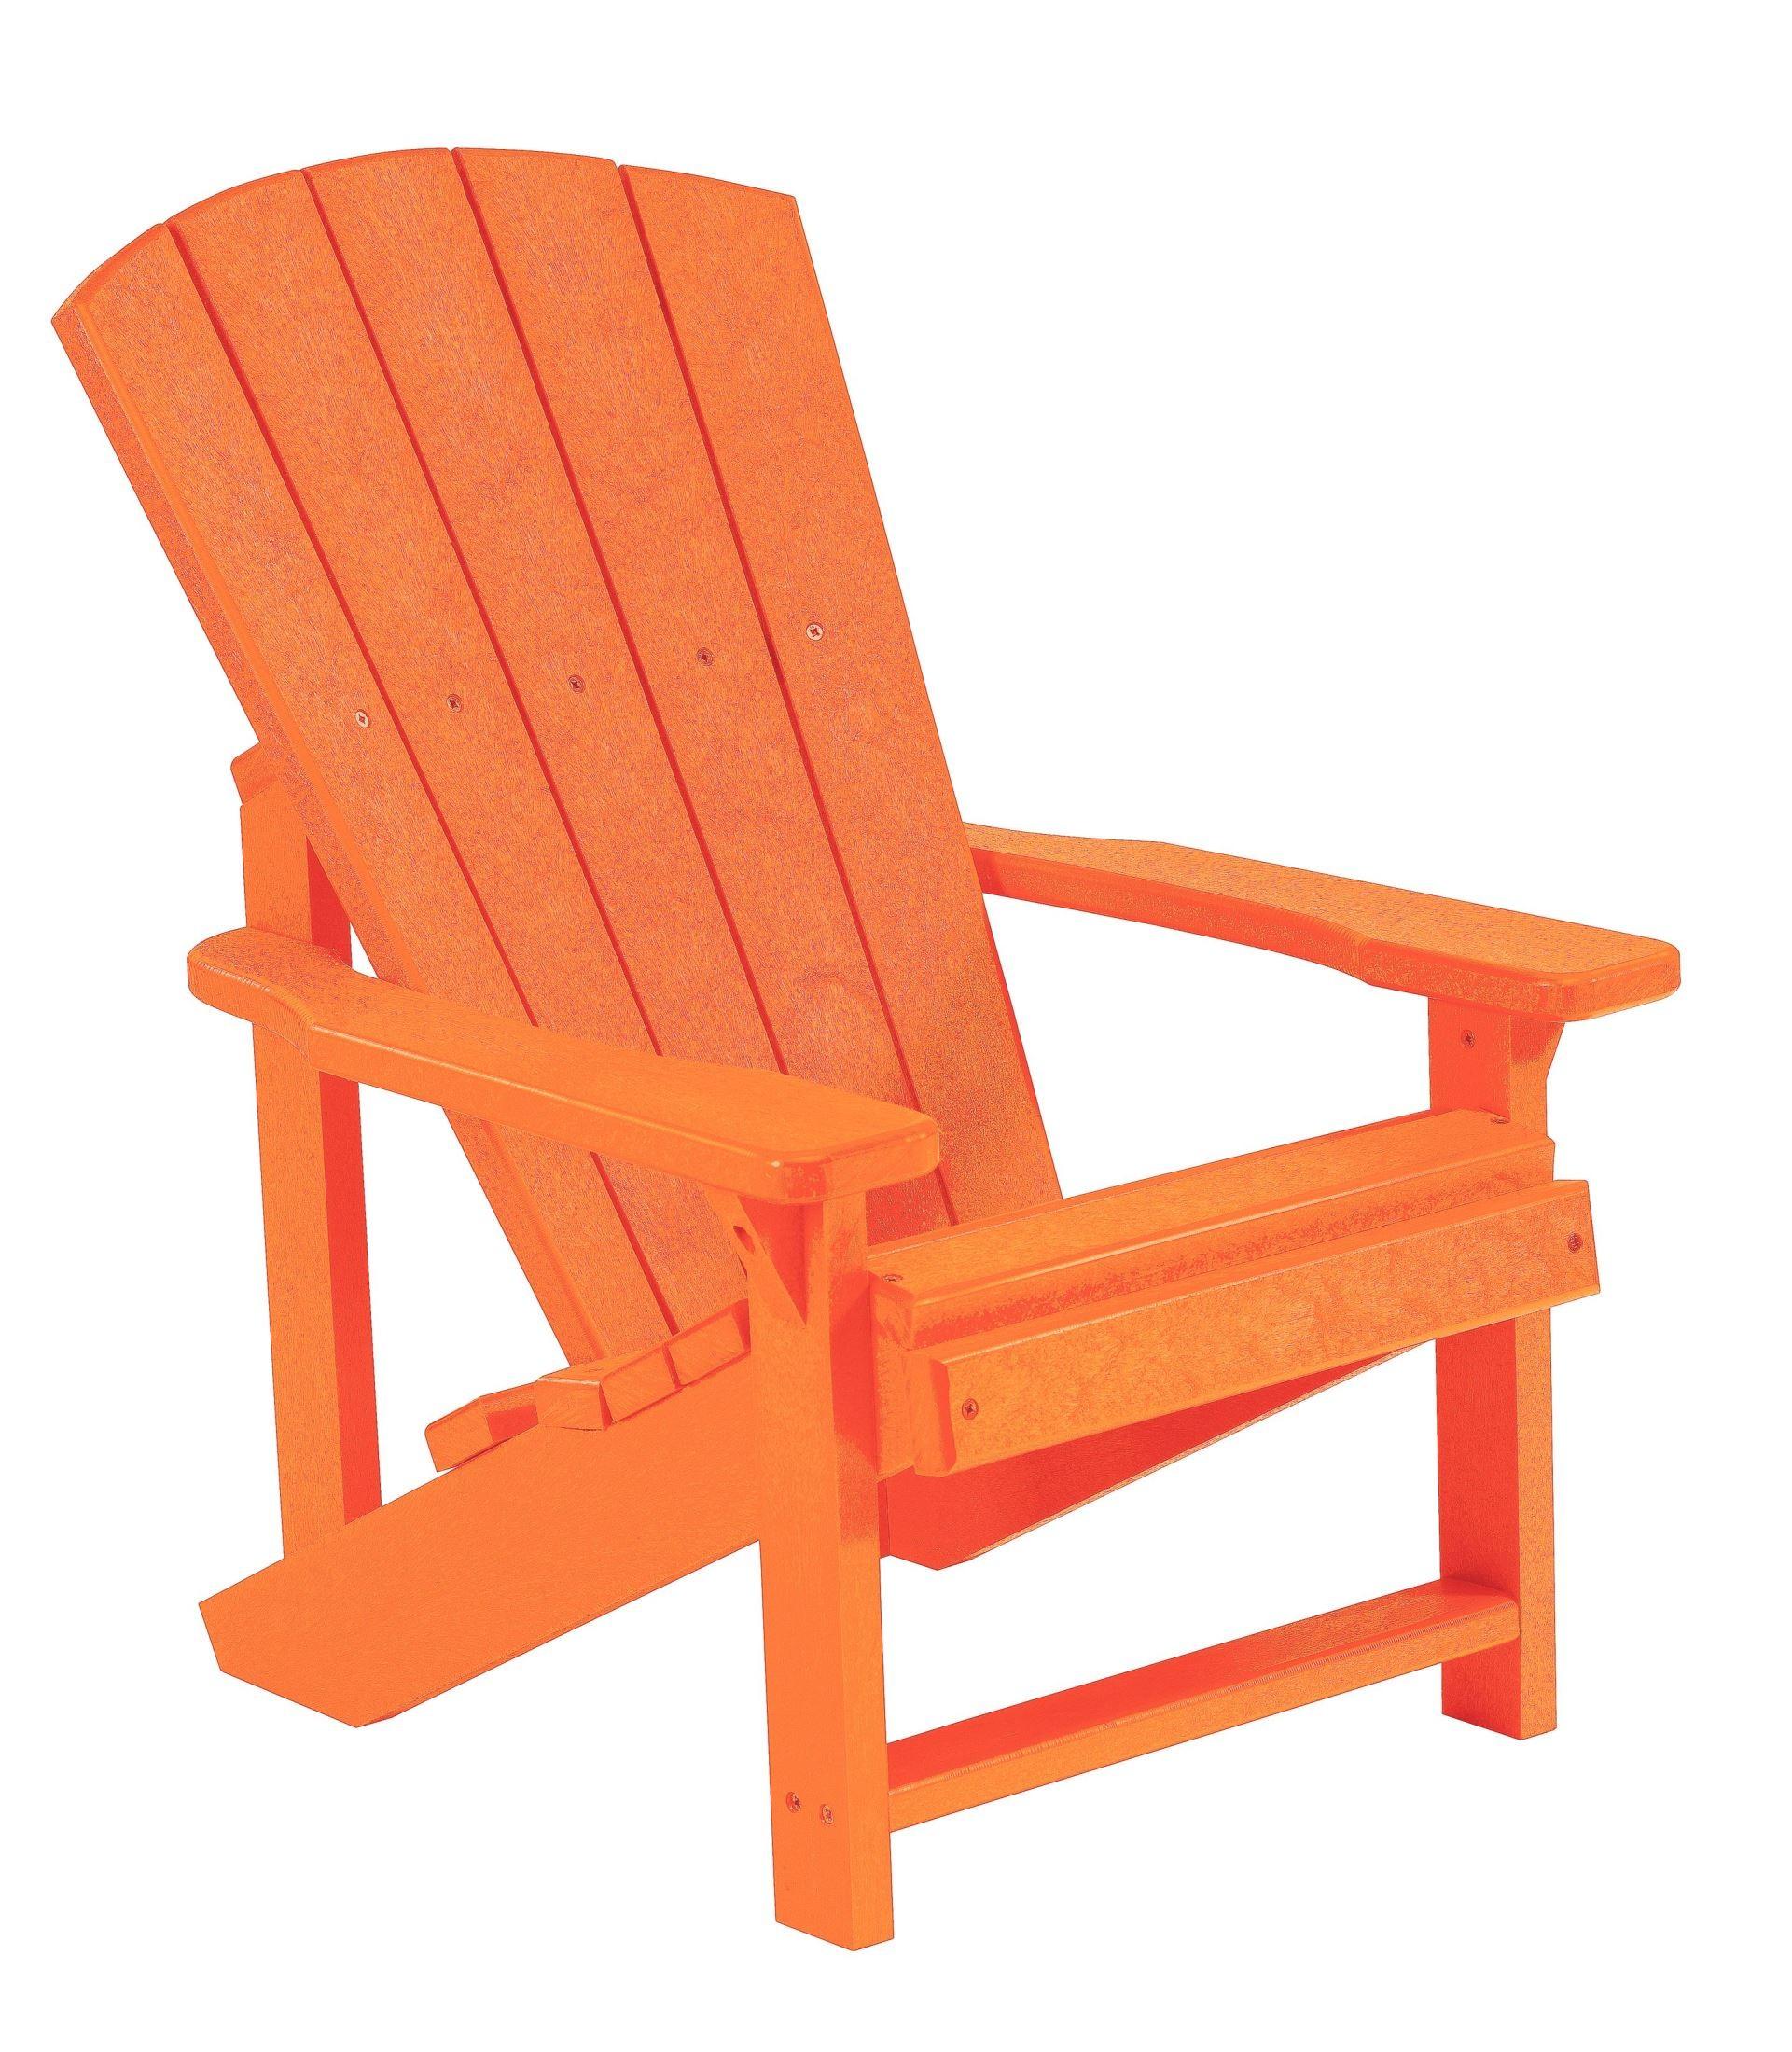 Generations orange kids adirondack chair from cr plastic for Orange kids chair